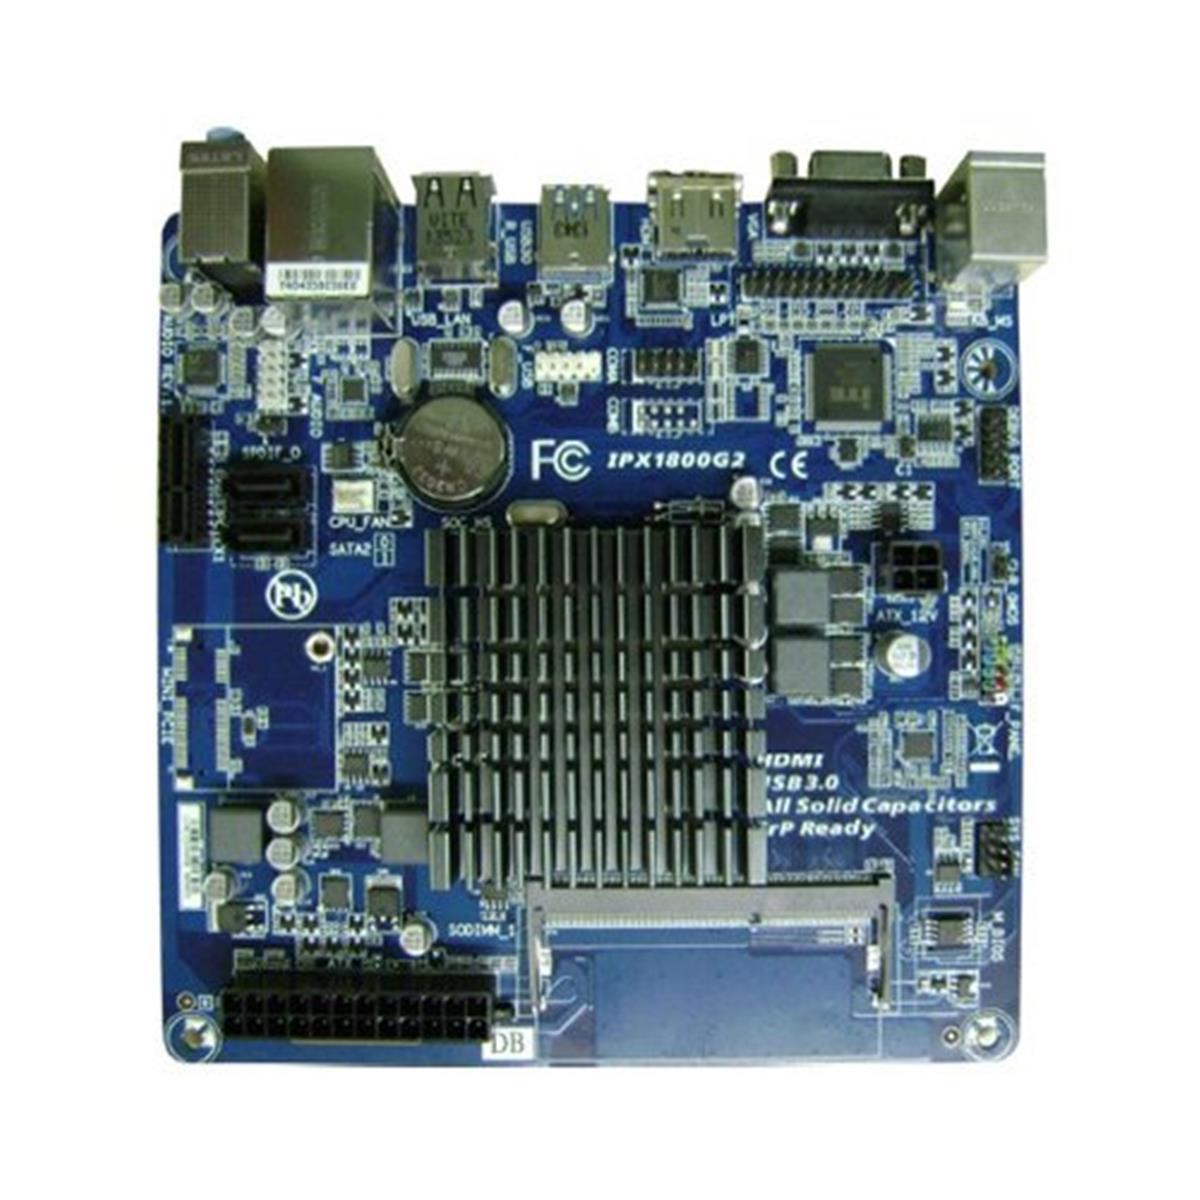 Placa Mae Pcware Mini ITX IPX1800G2 com INTEL Celeron DUAL-CORE